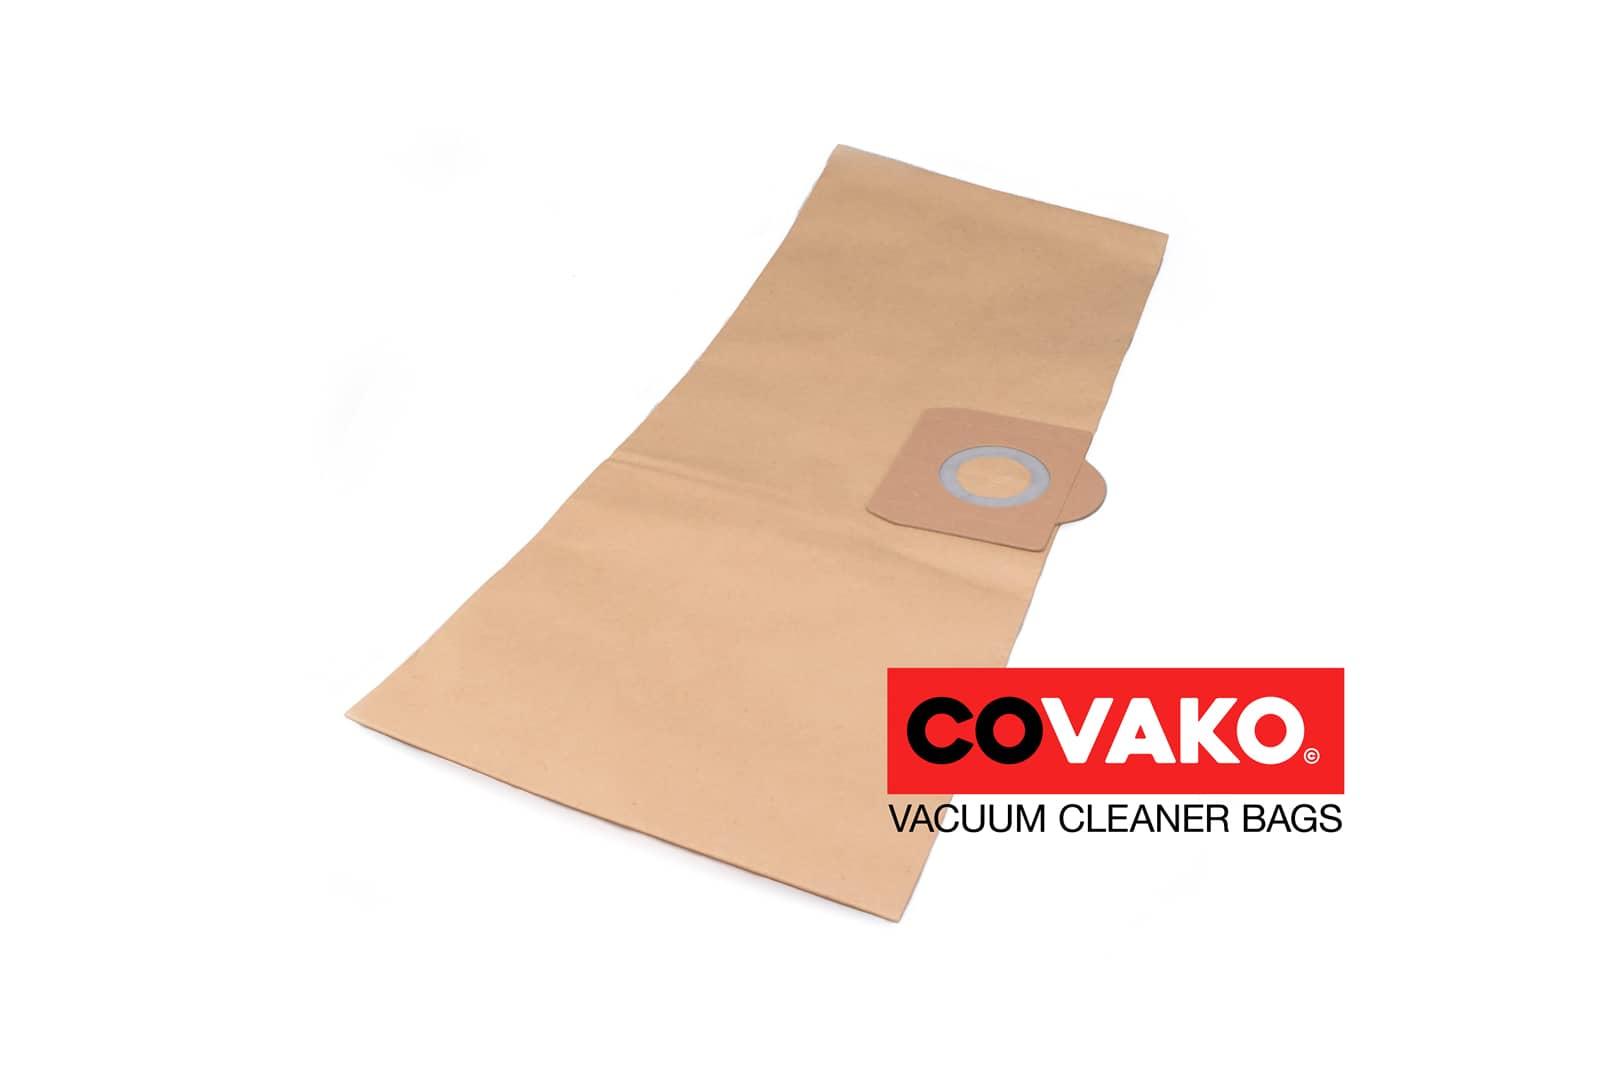 Einhell RT-VC 1525 SA / Paper - Einhell vacuum cleaner bags